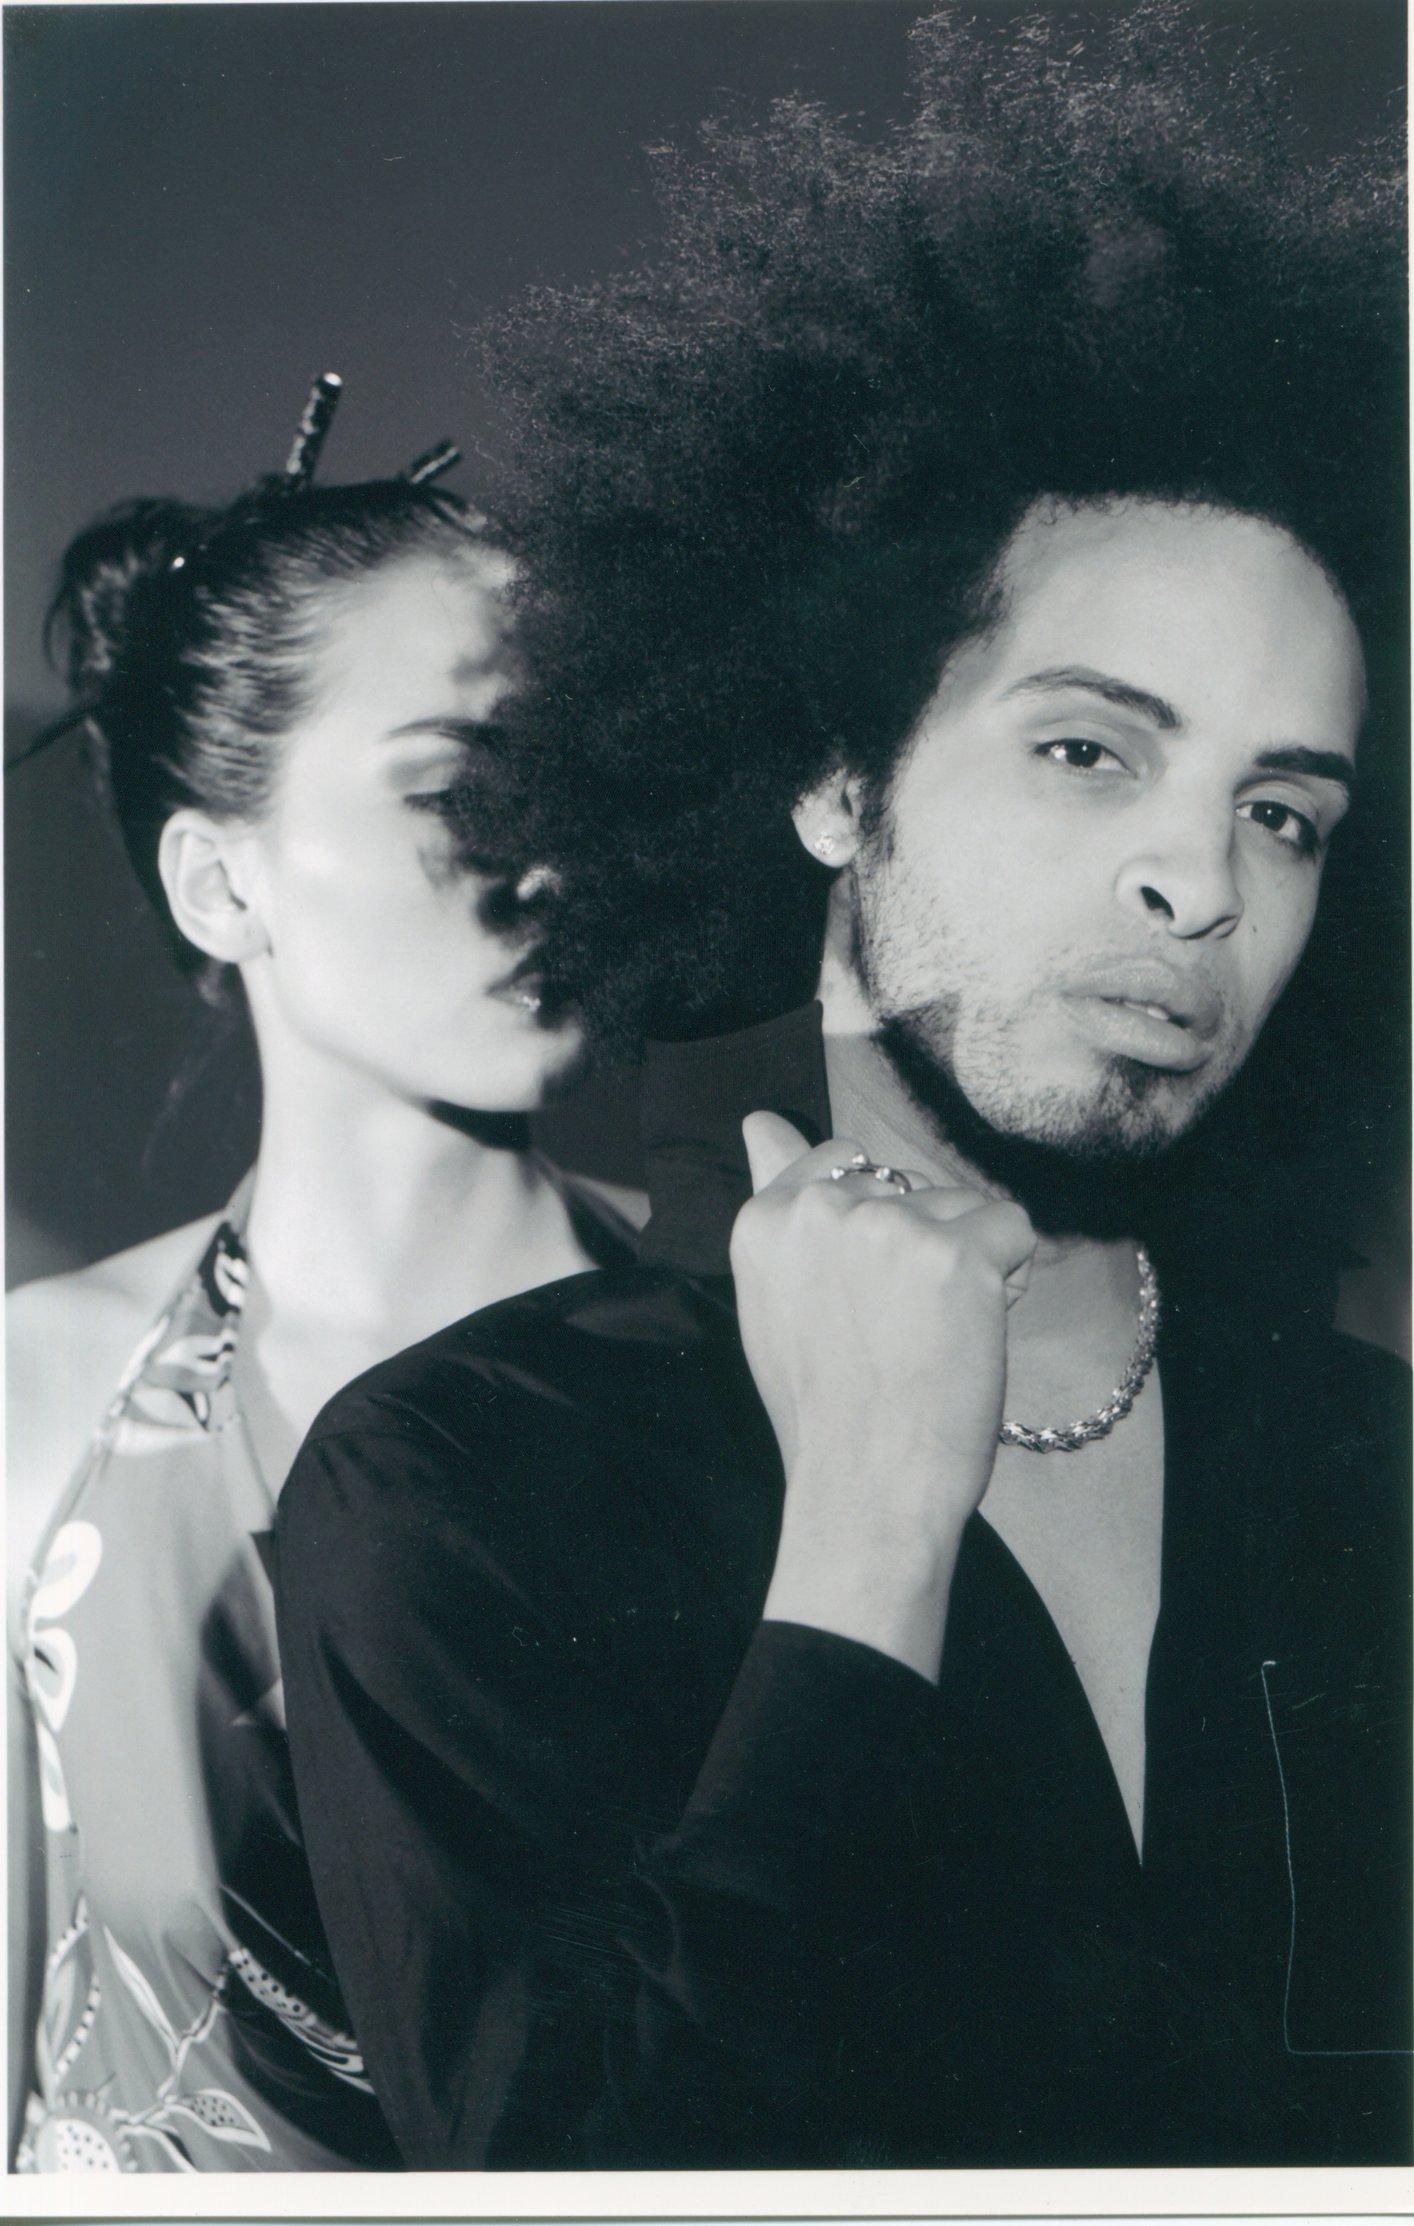 FRANCISCO DEL- INTERNATIONAL RECORDING ARTIST, COMPOSER, SINGER, MUSICIAN, AND ARTIST.